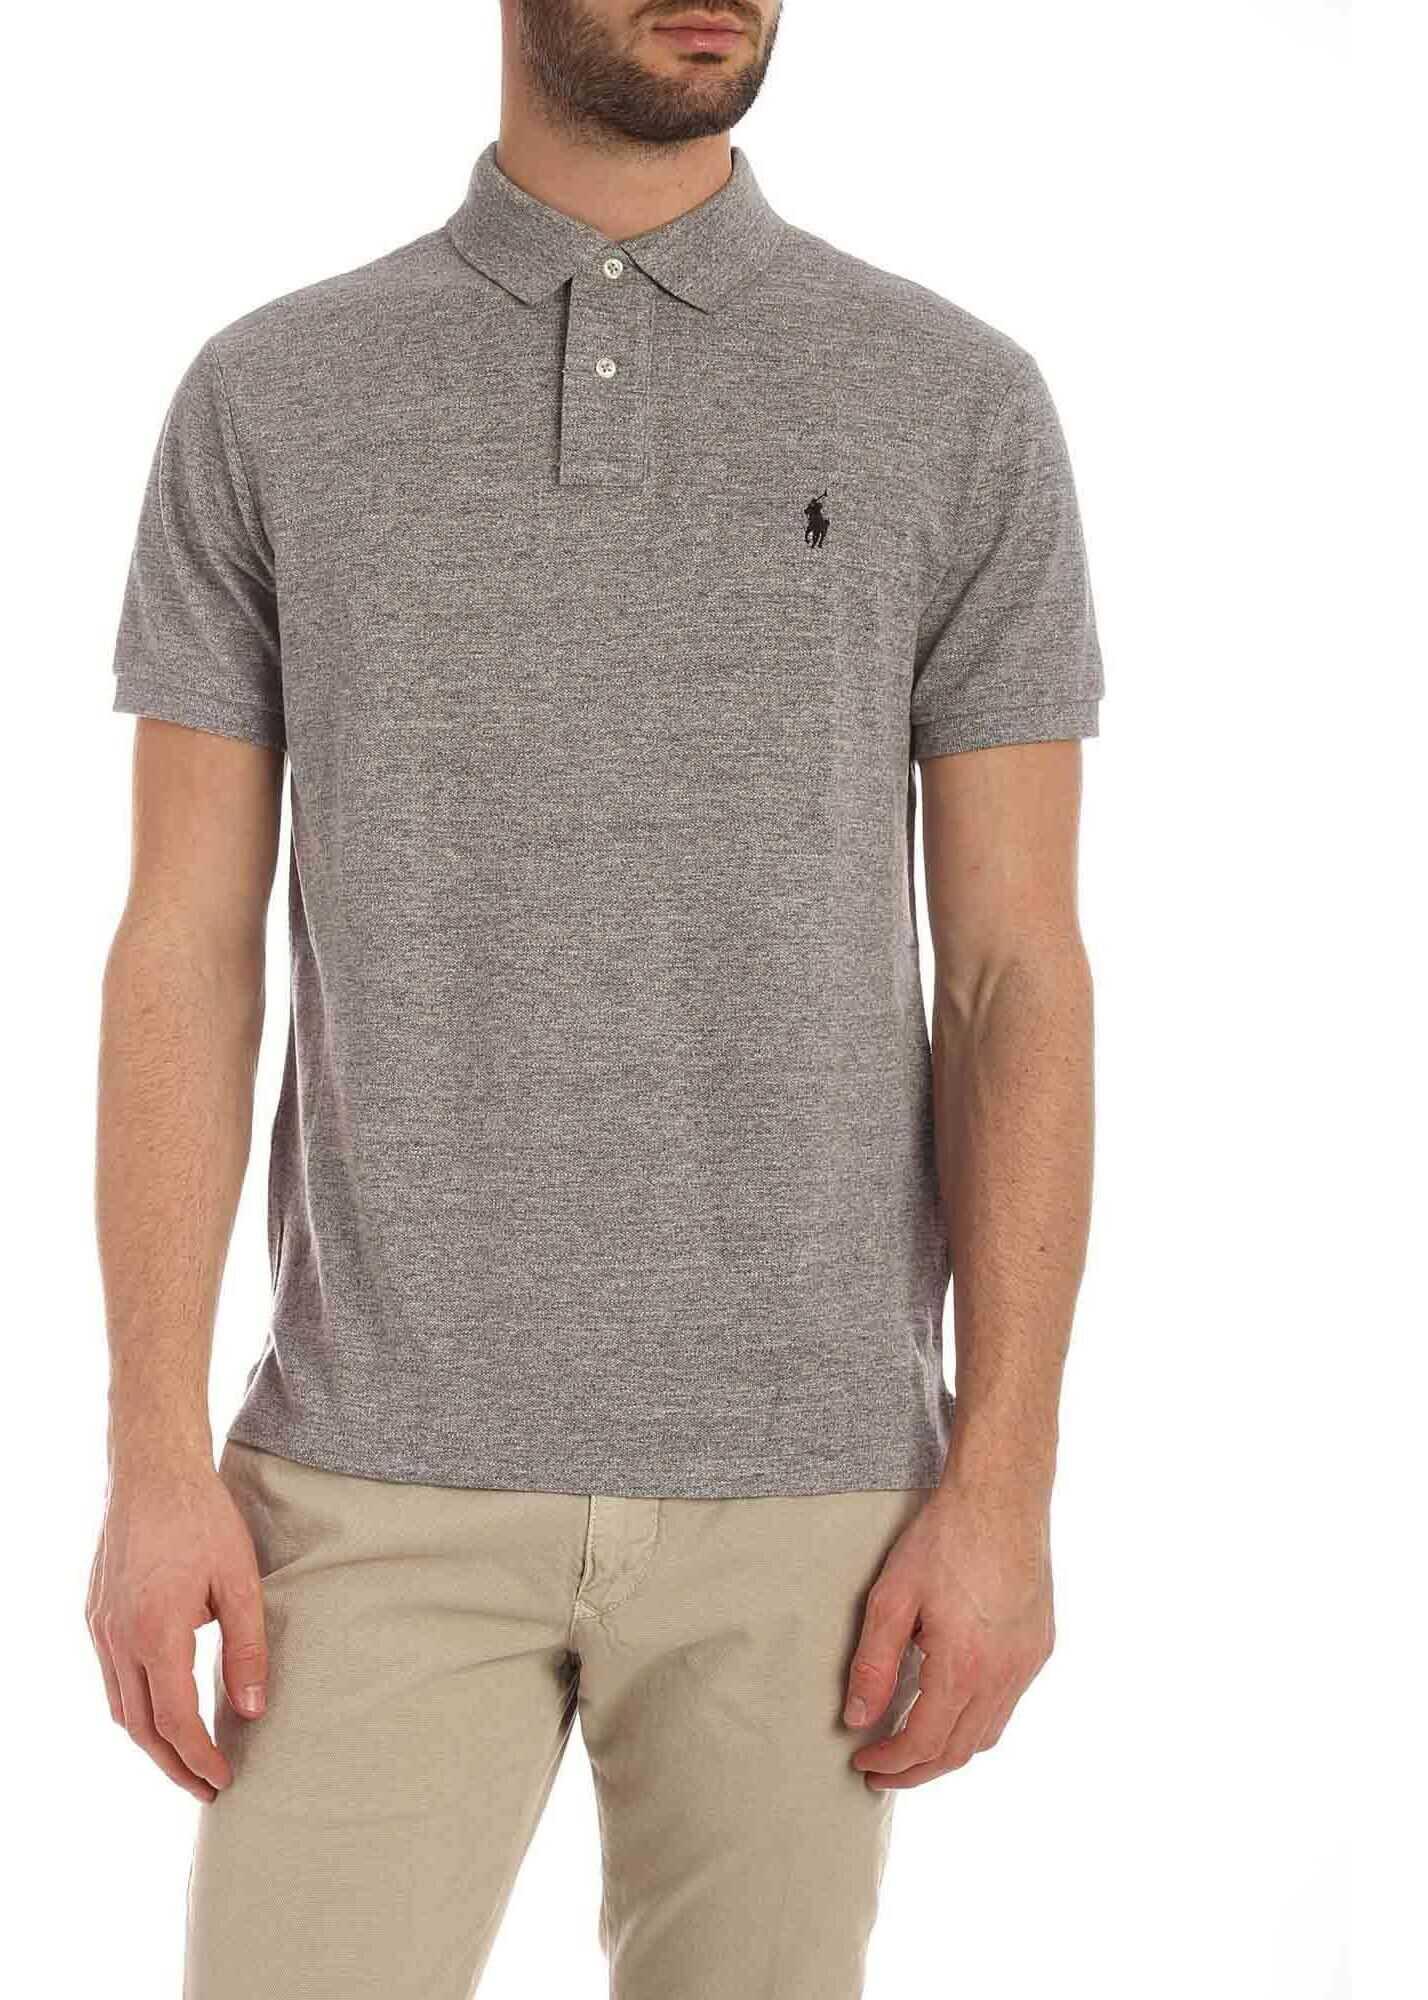 Ralph Lauren Black Logo Embroidery Polo Shirt In Melange Grey Grey imagine